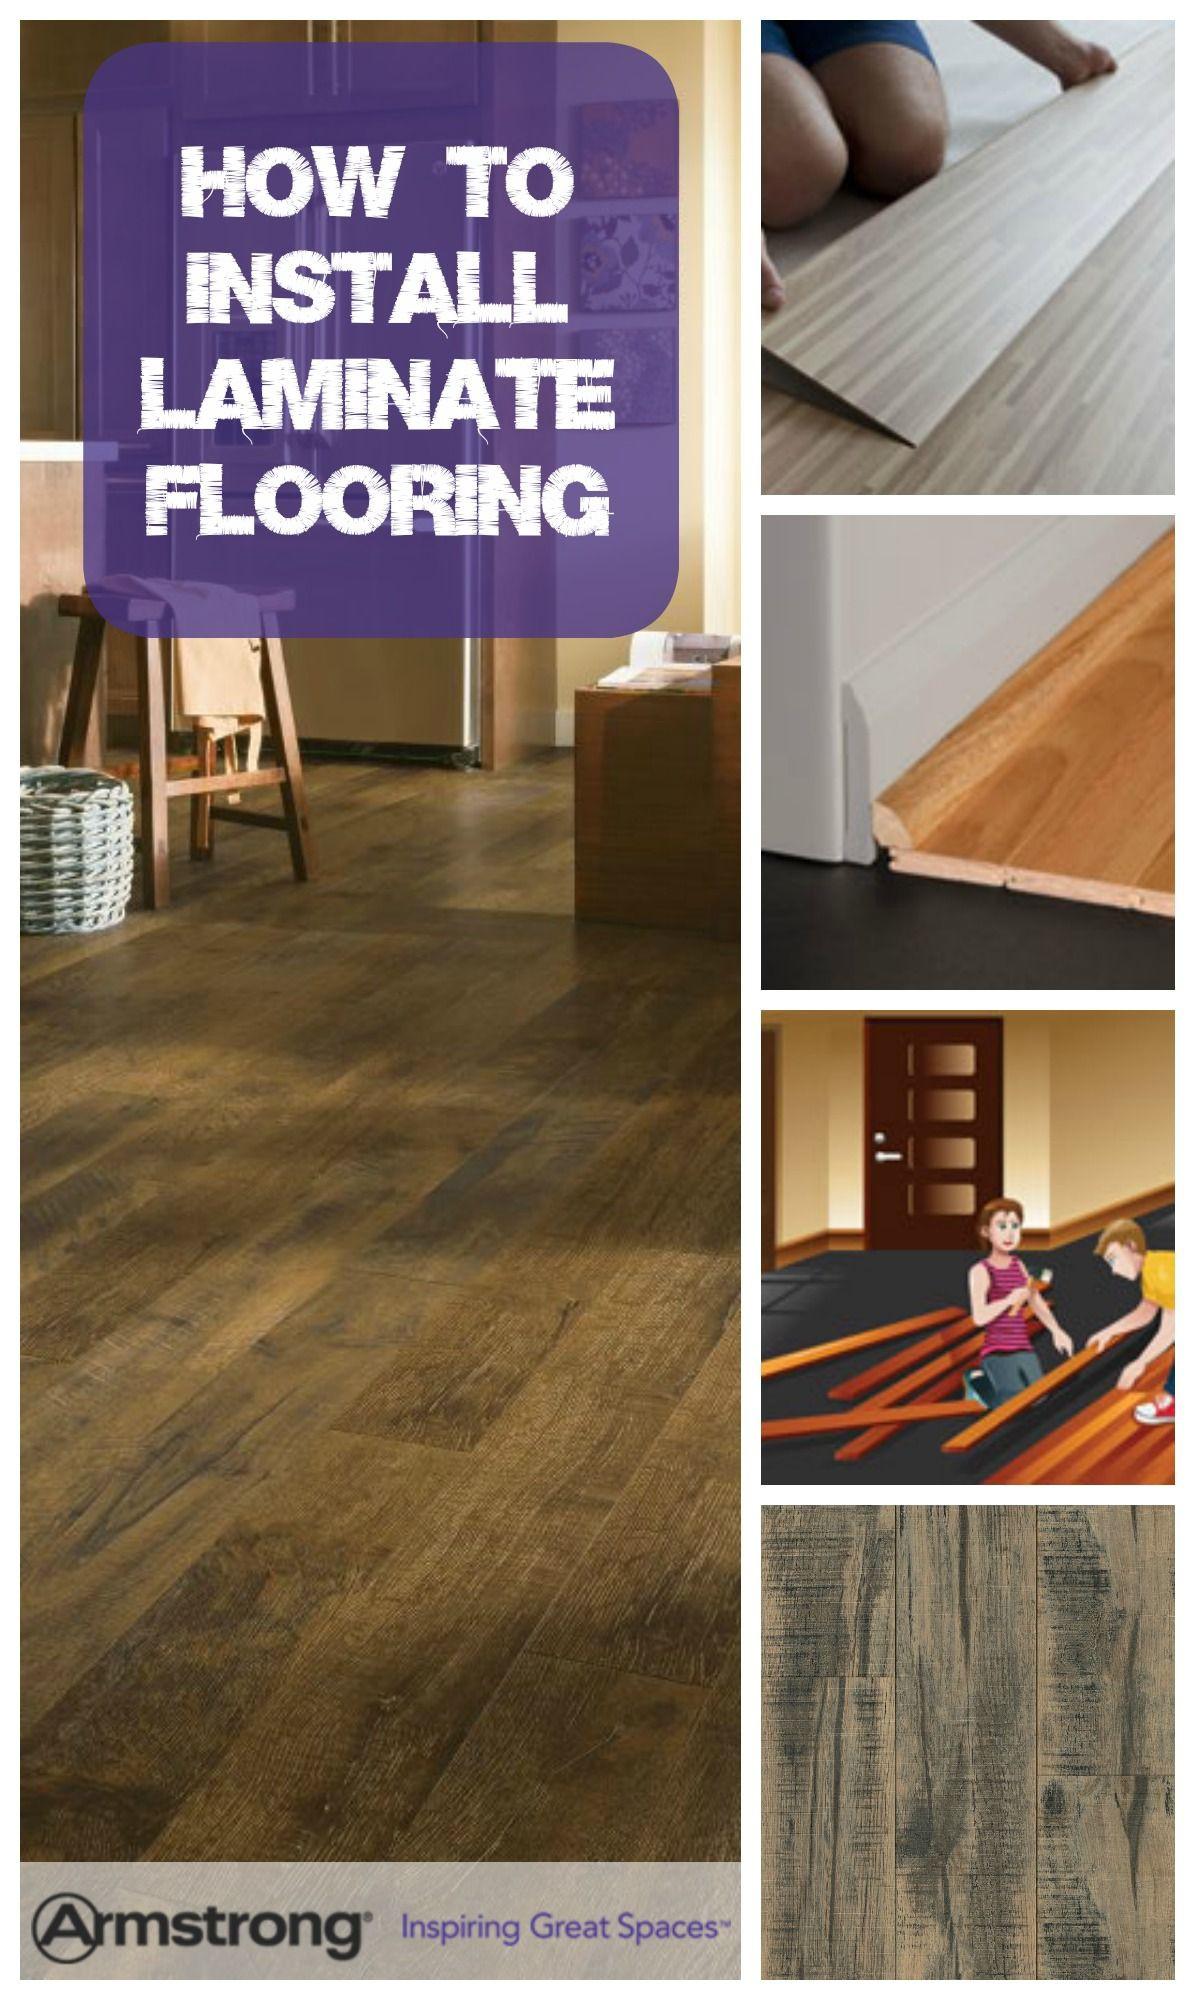 Diy Hardwood Floor Installation Of How Do You Install Laminate Flooring Weve Got All You Need to Know Pertaining to How Do You Install Laminate Flooring Weve Got All You Need to Know